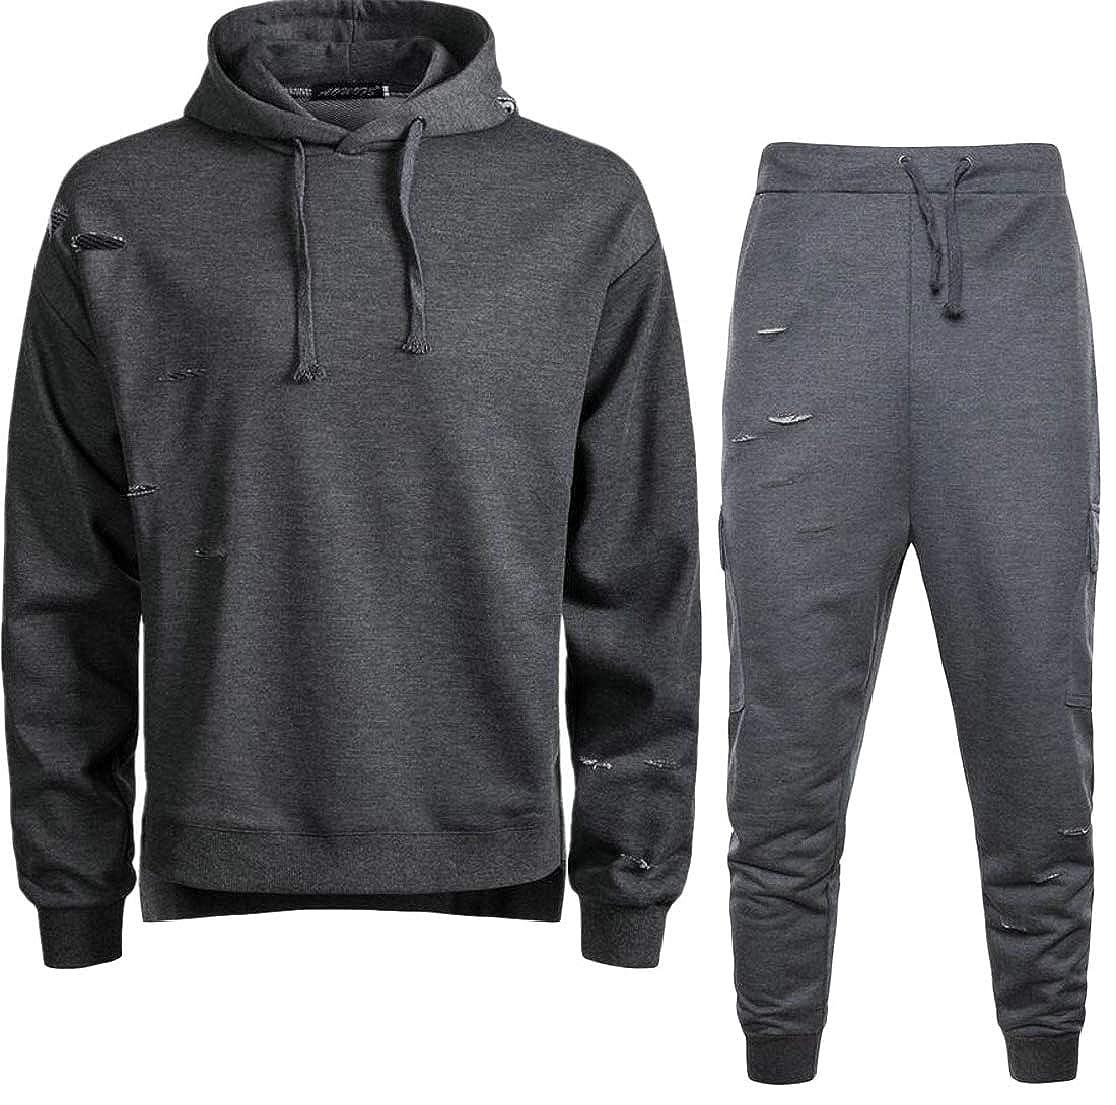 M/&S/&W Mens Athletic Ripped Hoodies Gym Jogger Pants Tracksuits Sweatsuit 2PCS Set